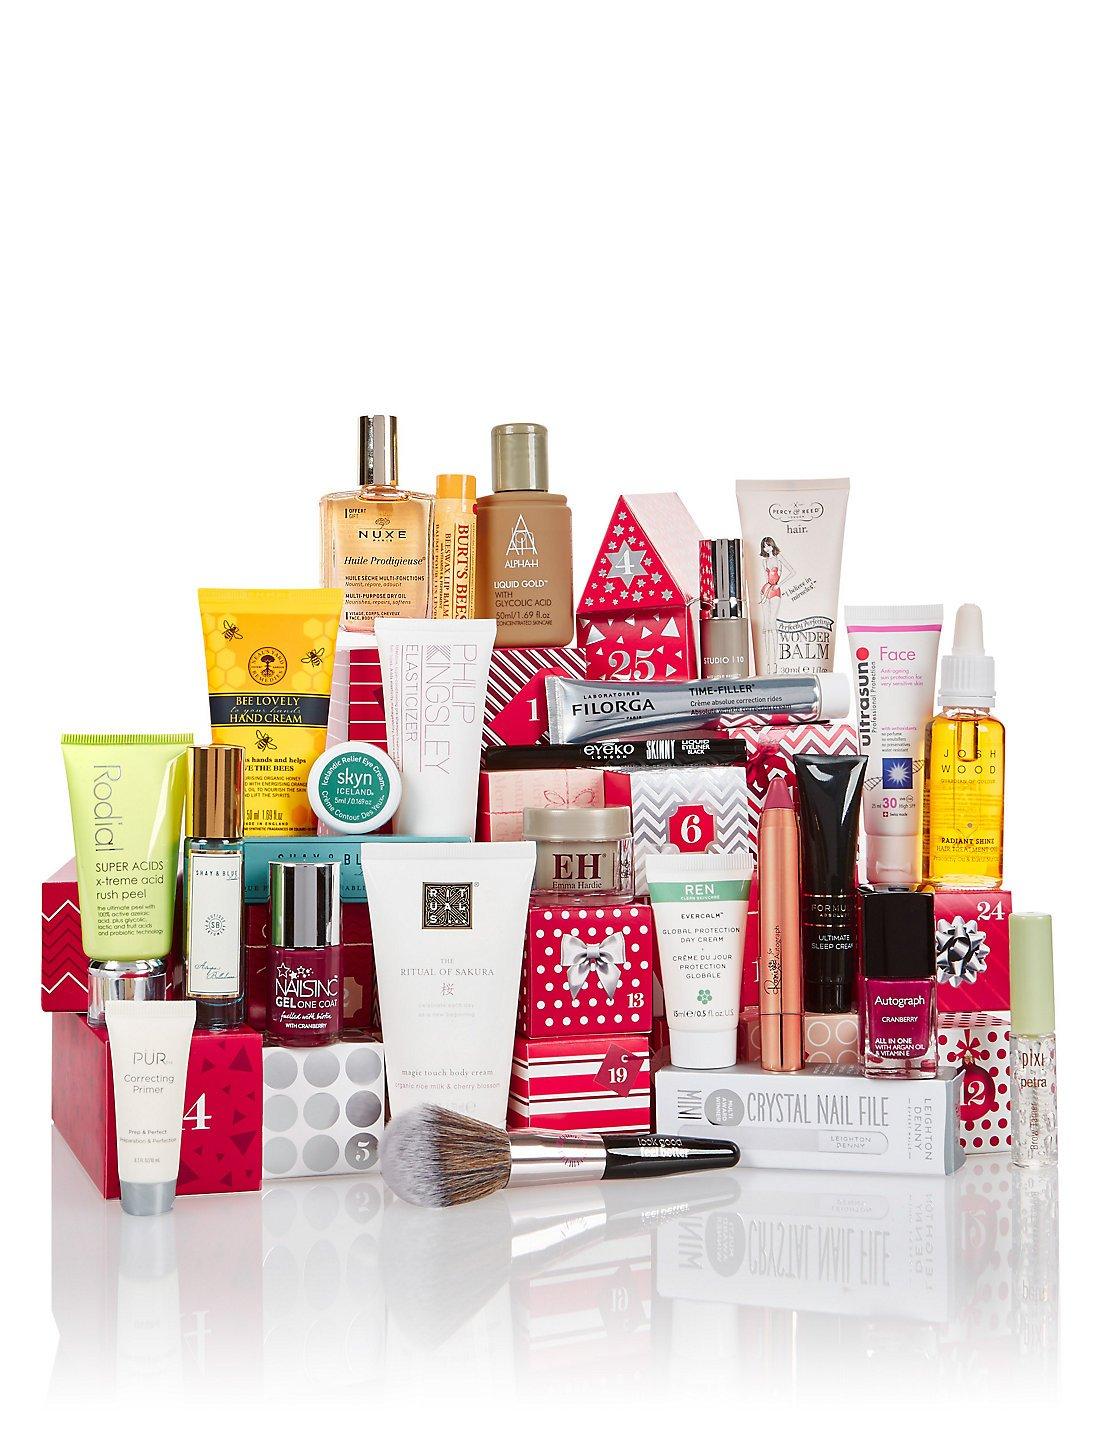 M&s Beauty Advent Calendar - £35 When You Spend £35+ | 2019 Diy How M&s Advent Calendar 2019